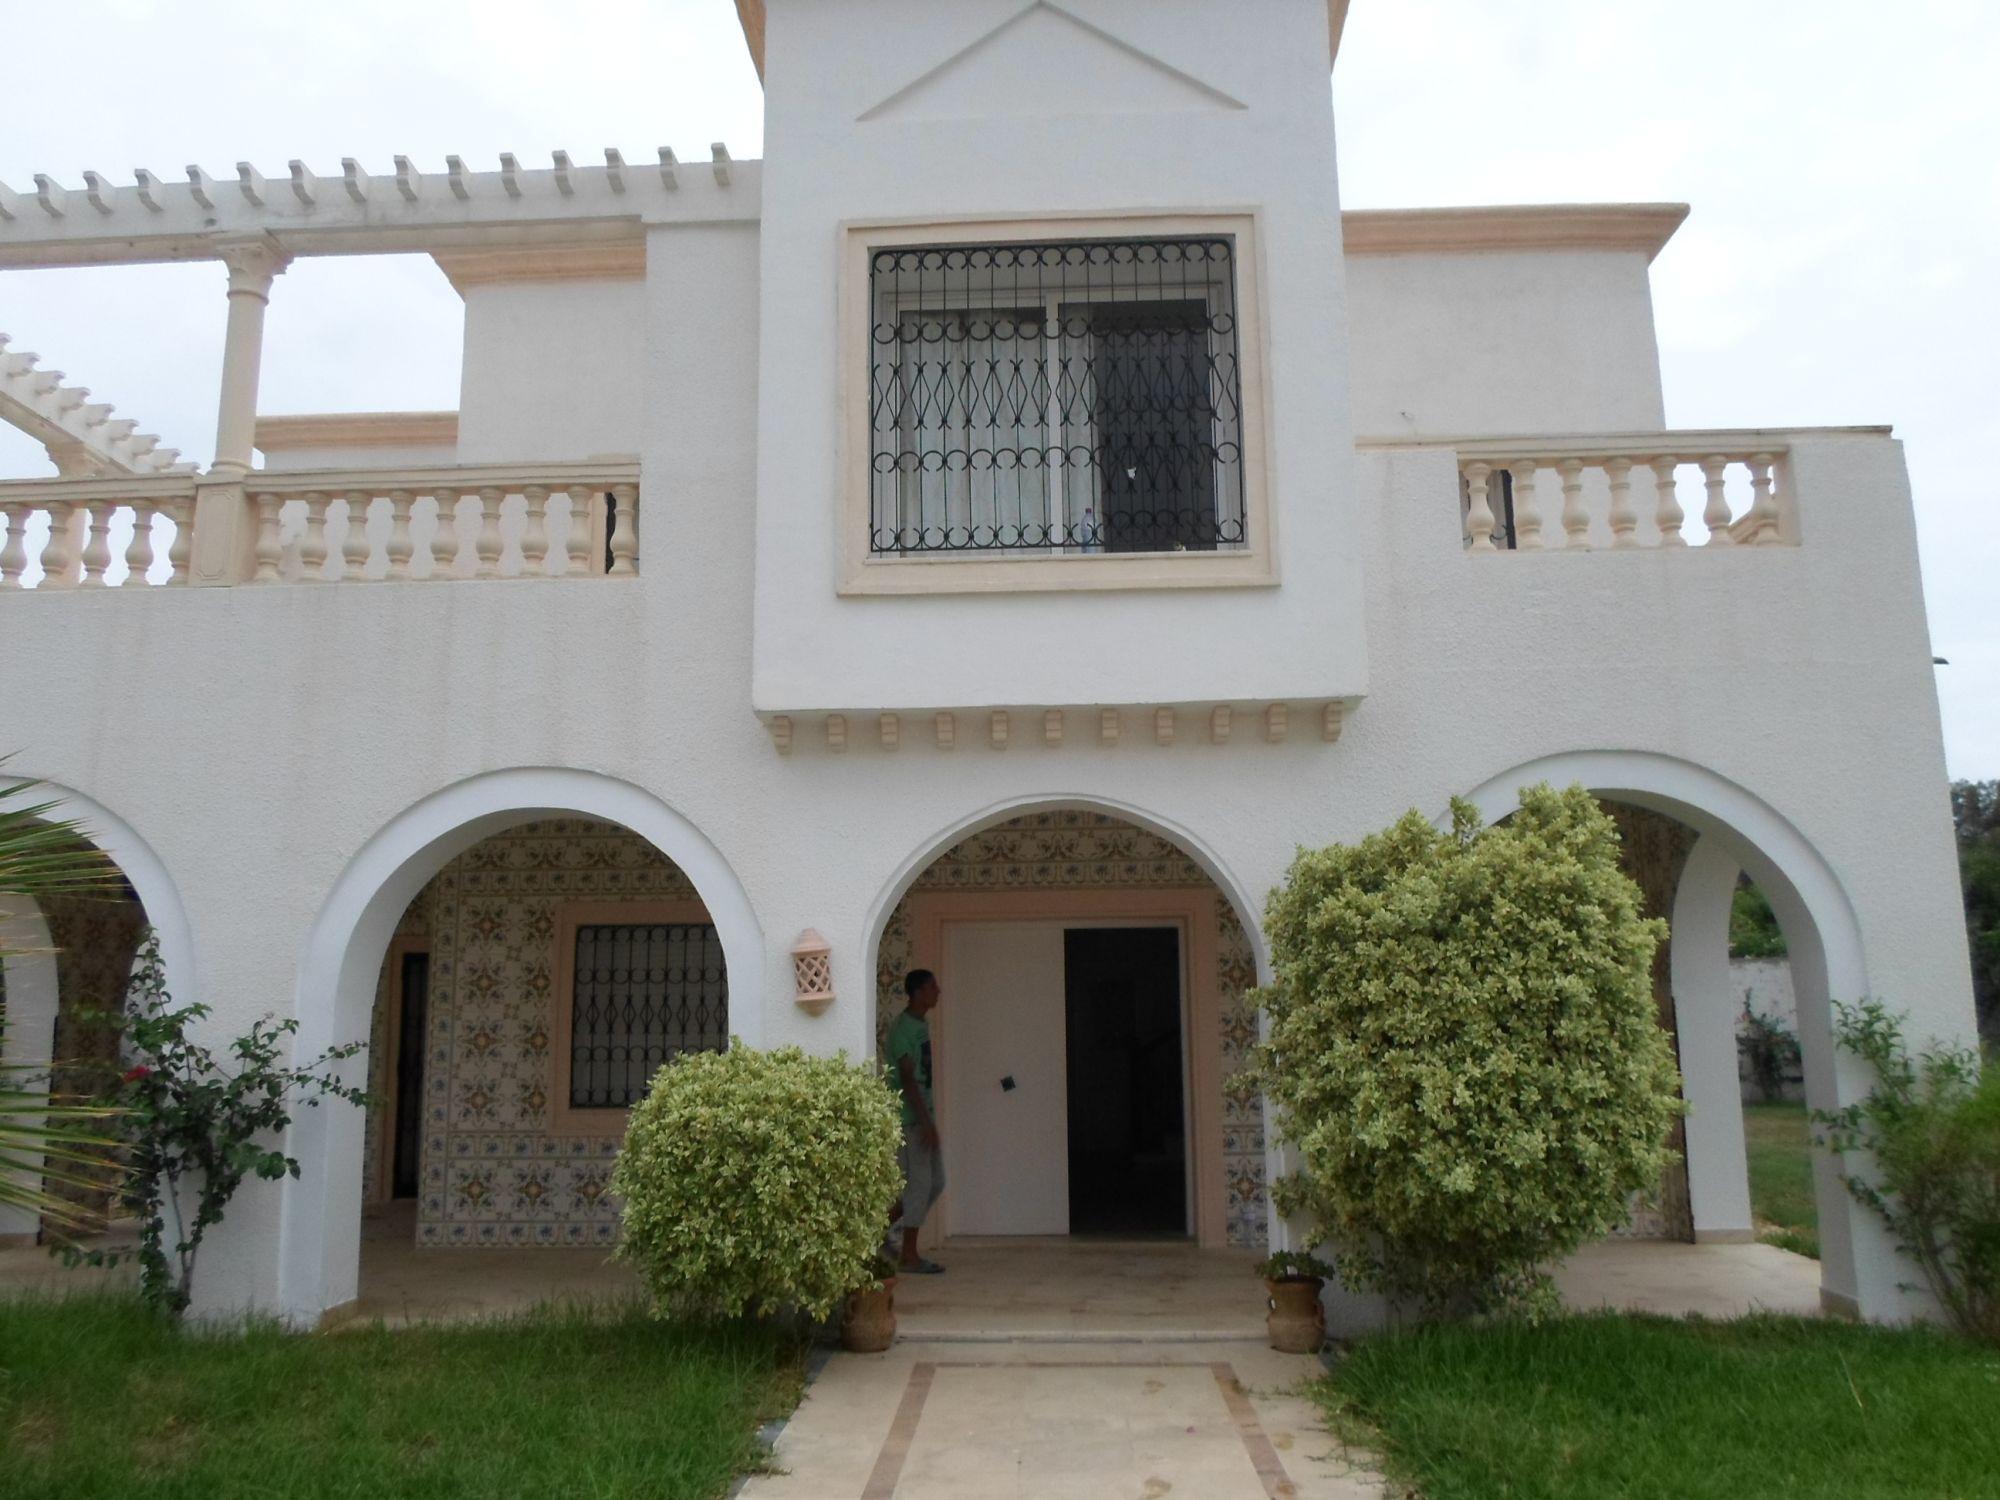 Al belle villa proche des h tels de yasmine hammamet for Des belles villas